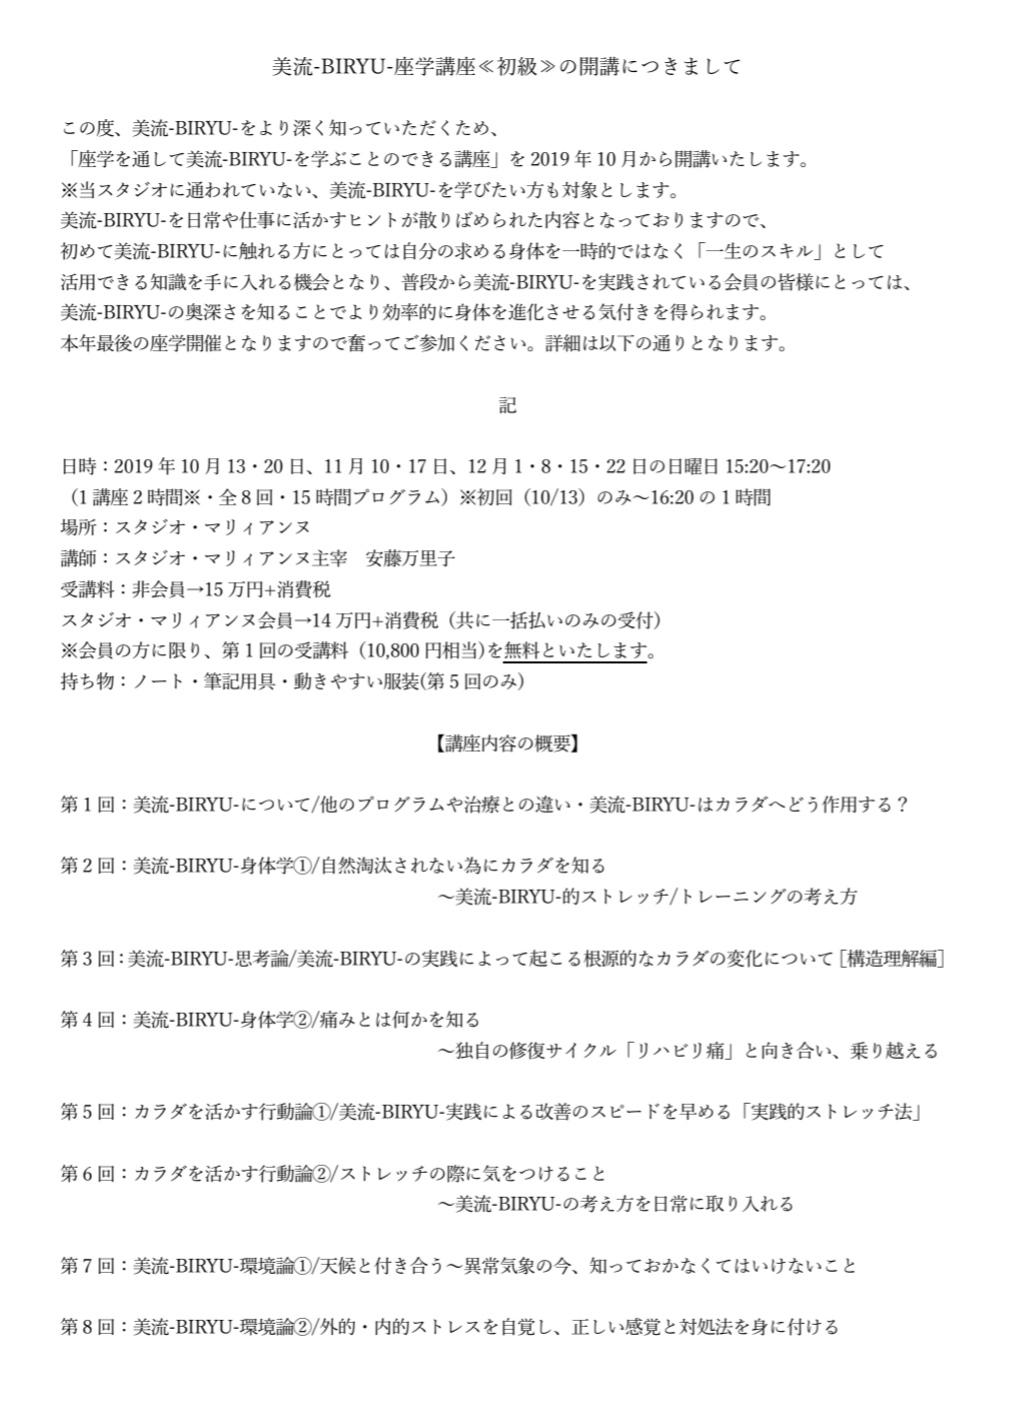 Screenshot_20190913_115522